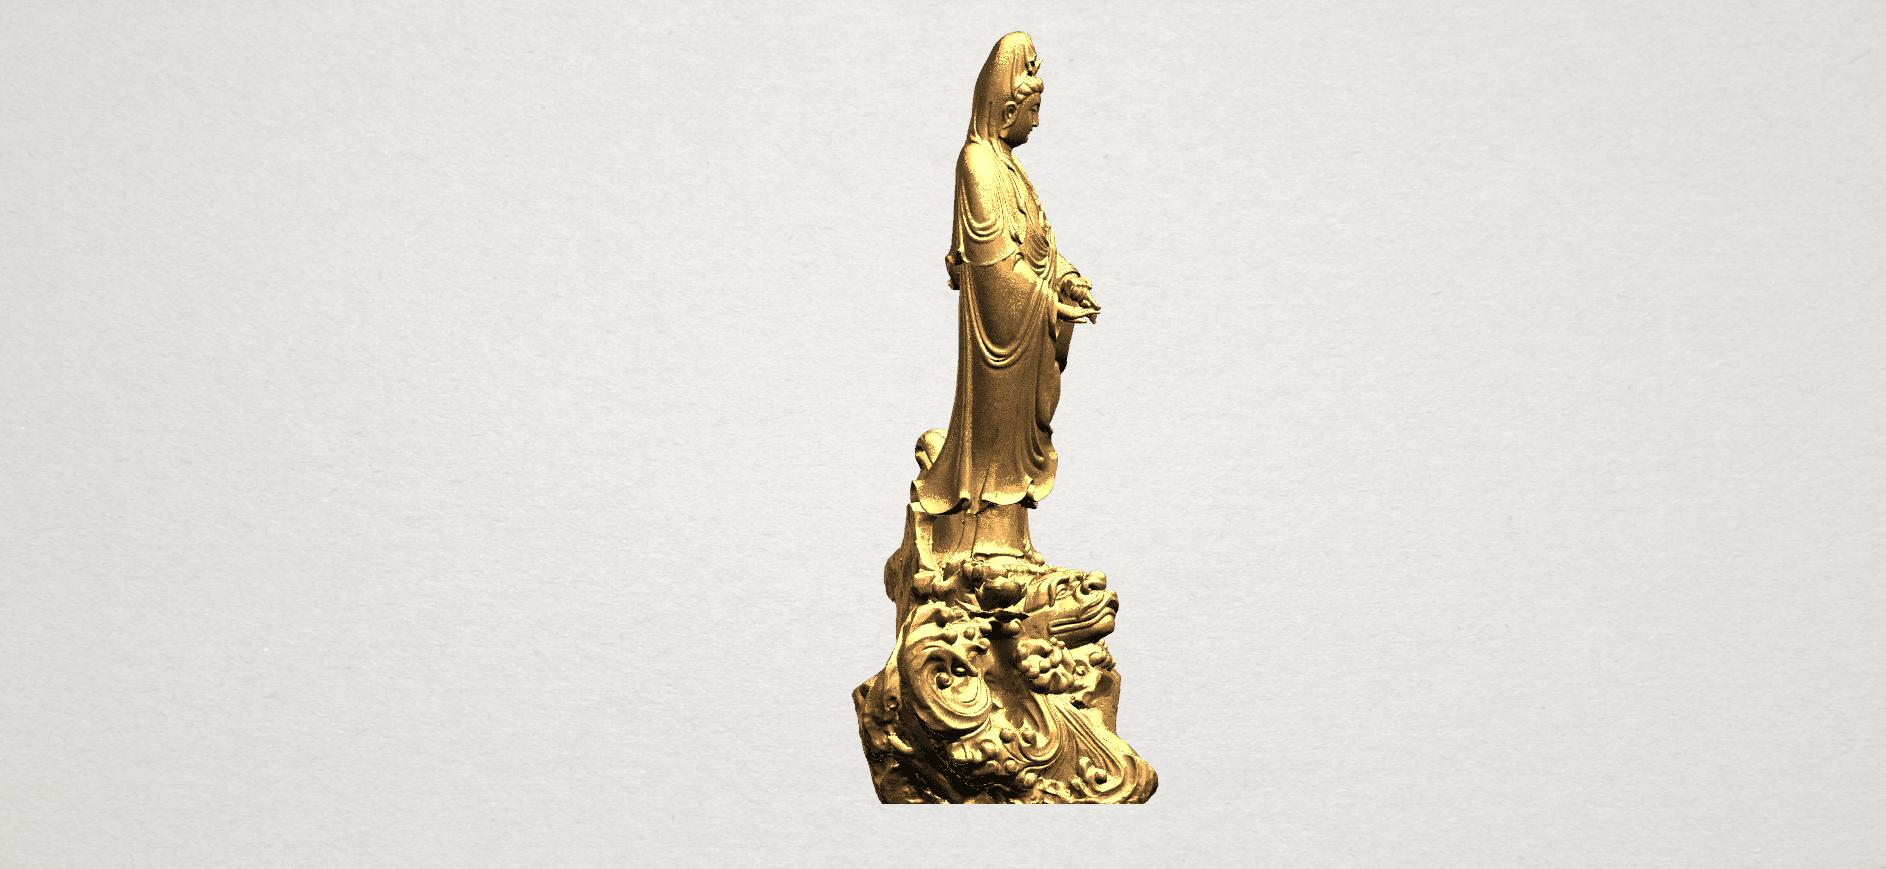 Avalokitesvara Buddha - Standing (ii) A07.png Download free STL file Avalokitesvara Bodhisattva - Standing 02 • Design to 3D print, GeorgesNikkei